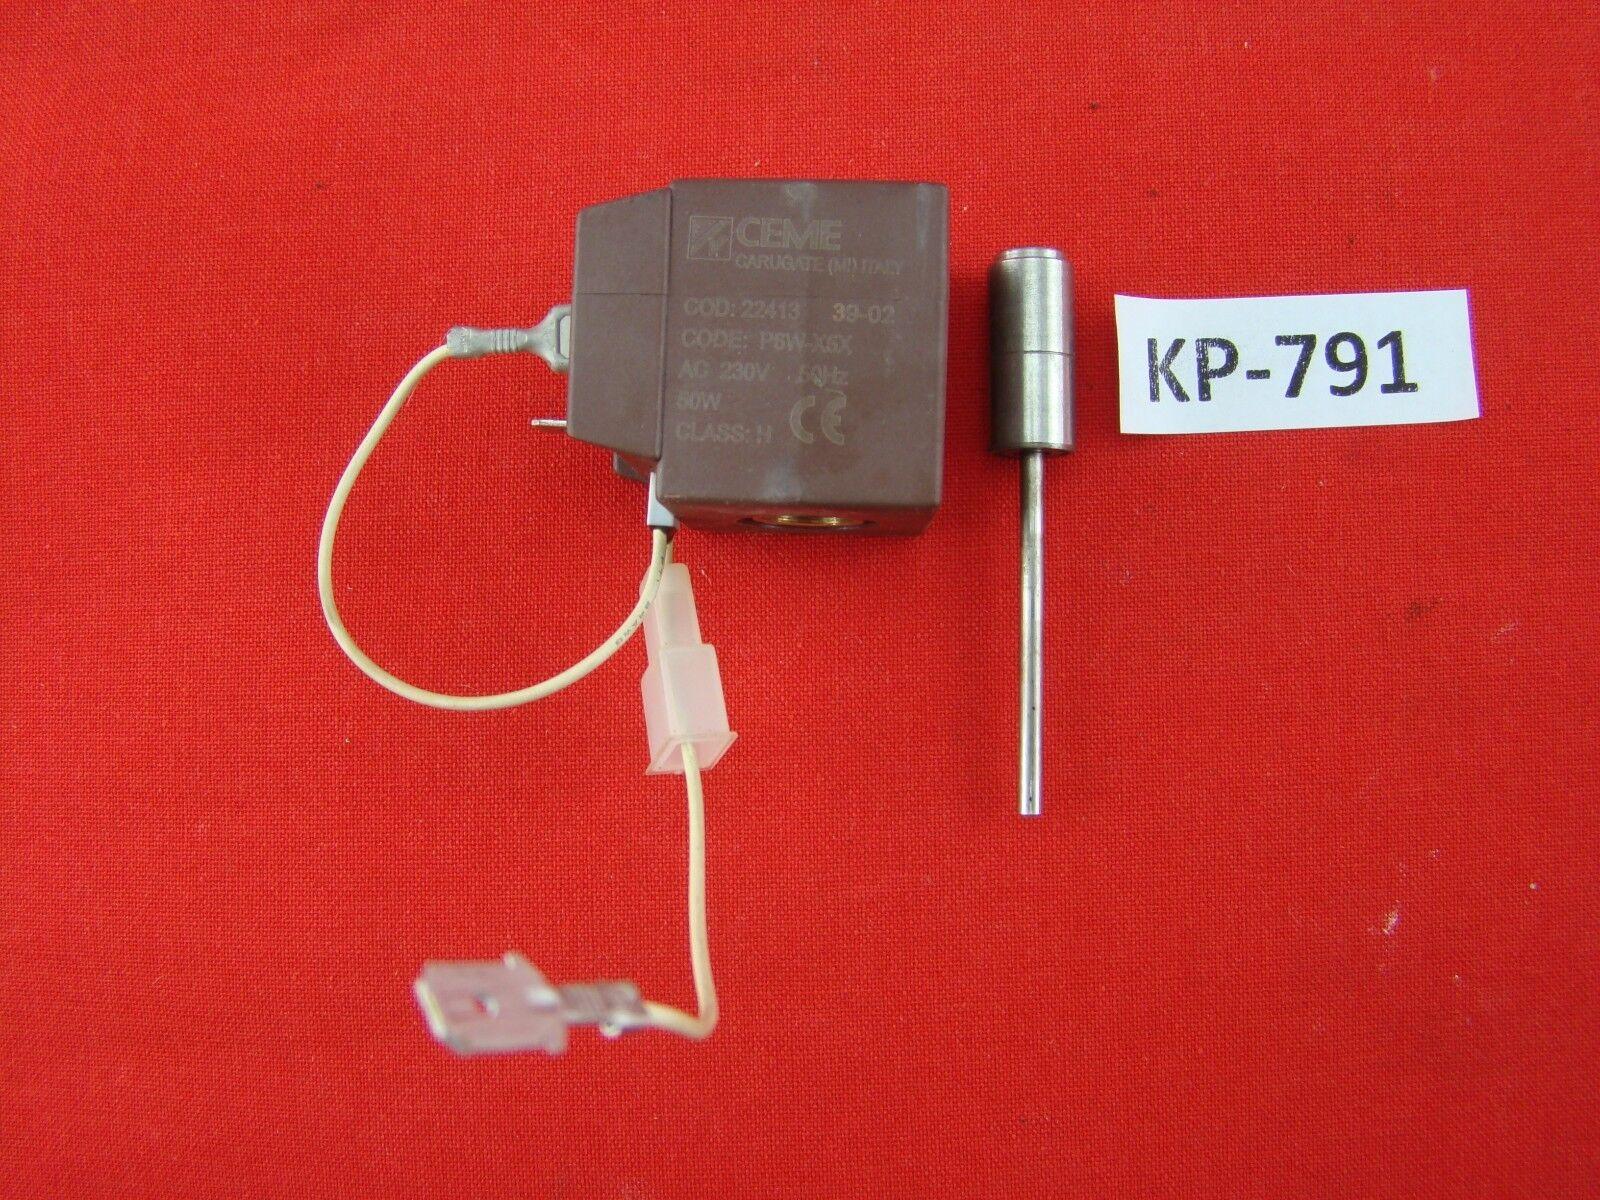 ORIGINAL Krups Type 860 CARUGATE 22413 34-02 p6w-x5x  kp-791